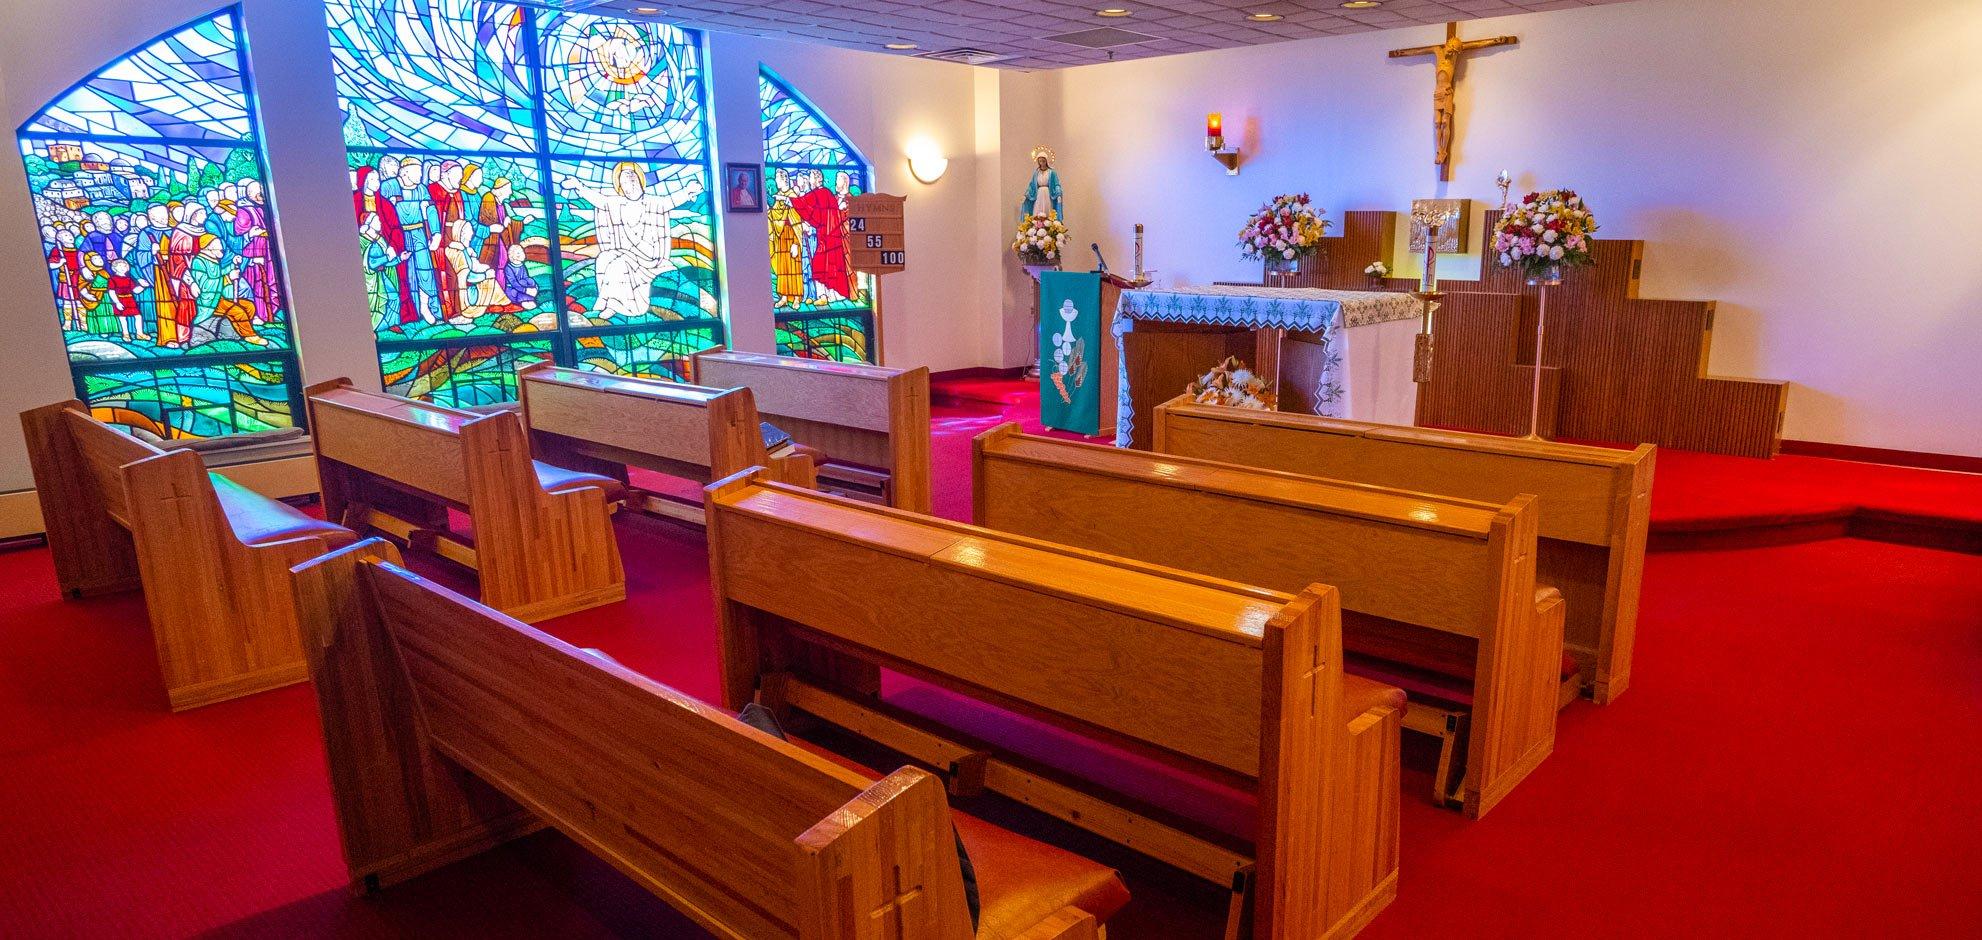 St. Joseph's Home chapel